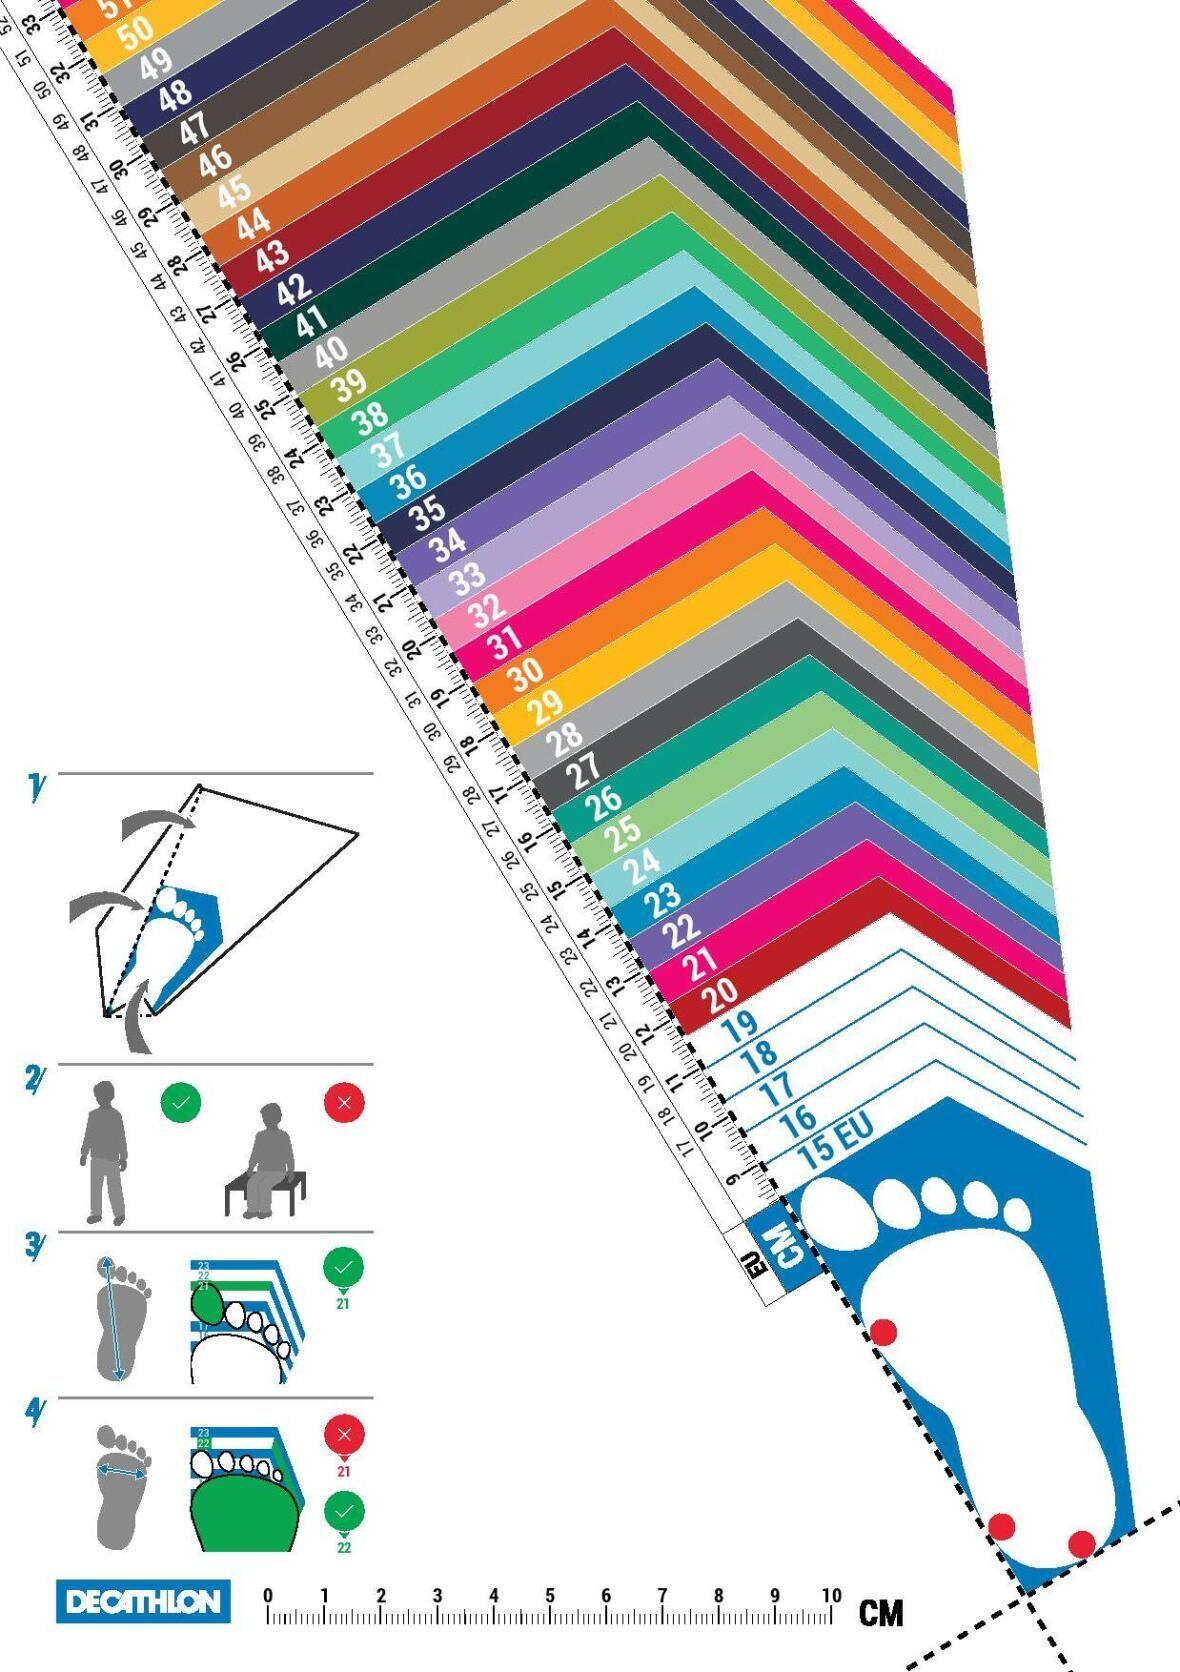 foot-measure-decathlon